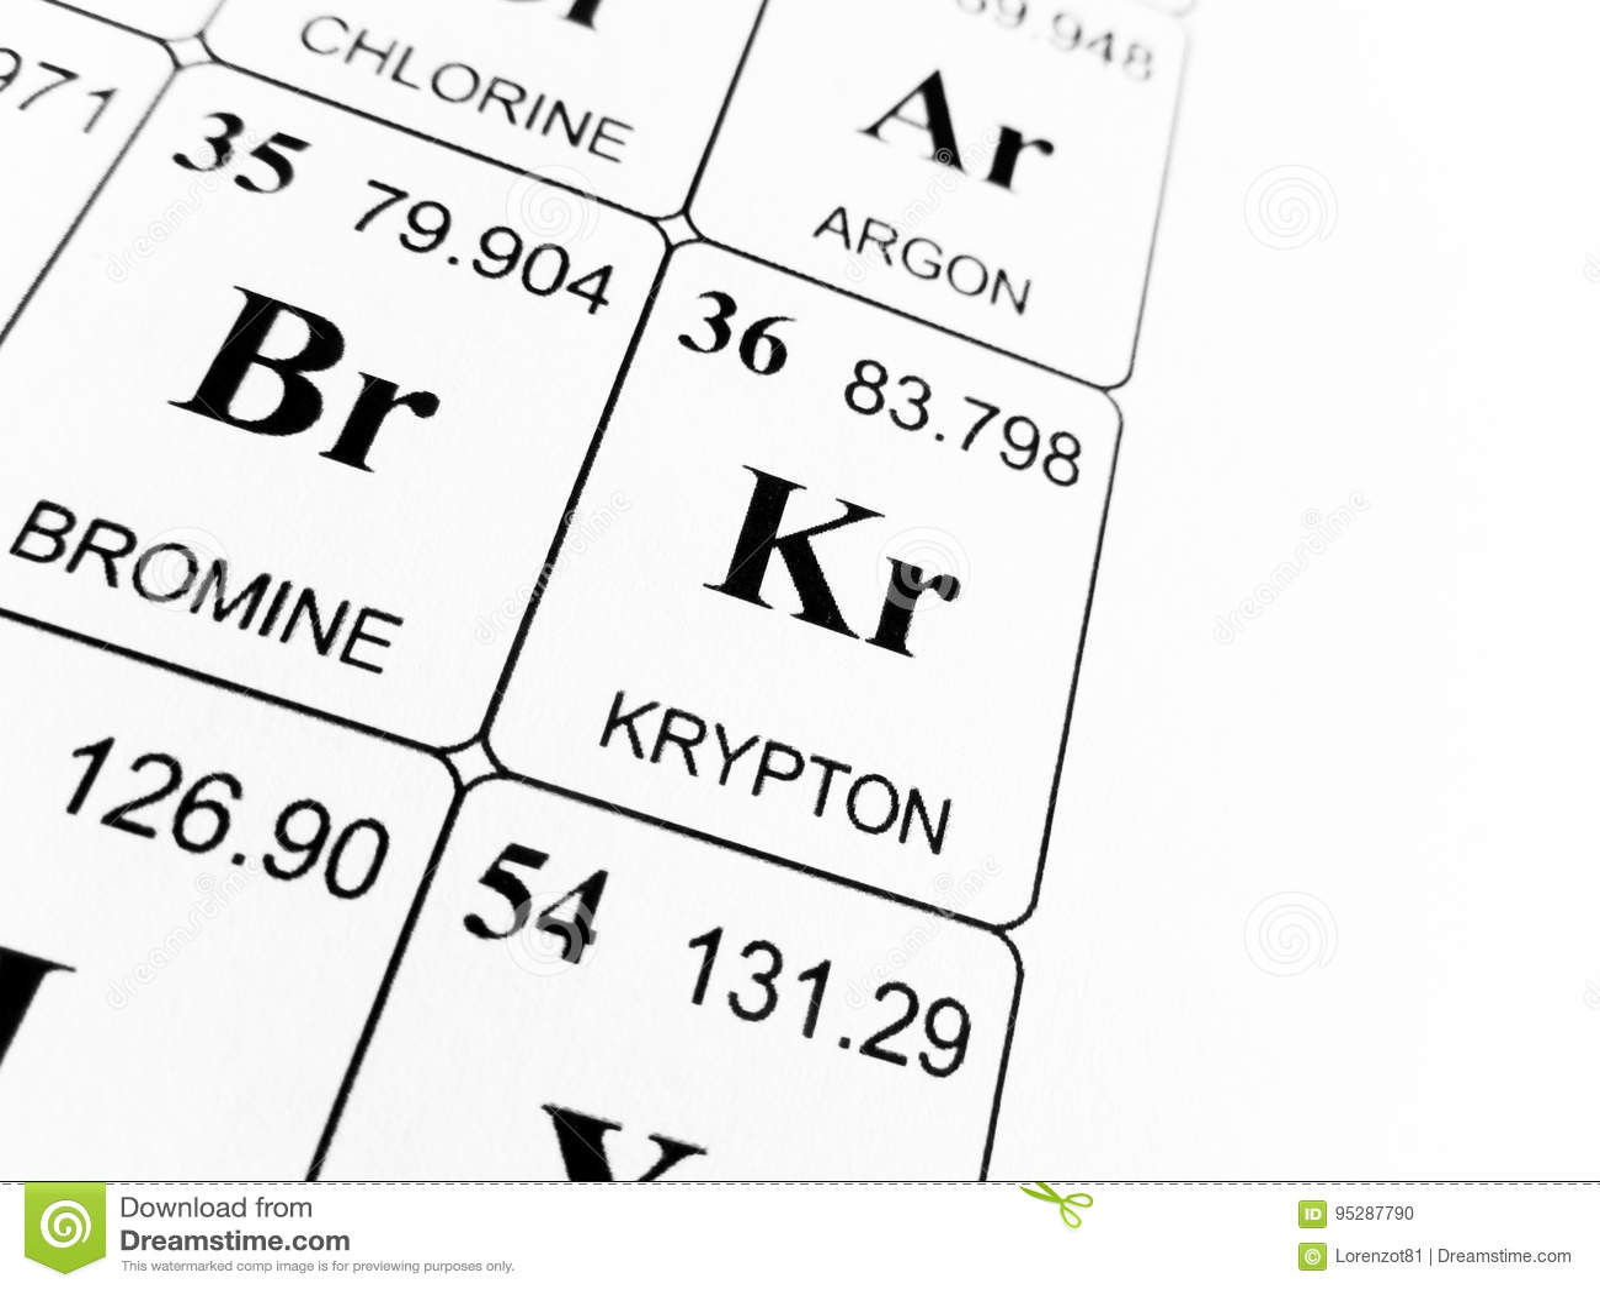 Krypton on the periodic table of the elements stock photo image of royalty free stock photo buycottarizona Choice Image